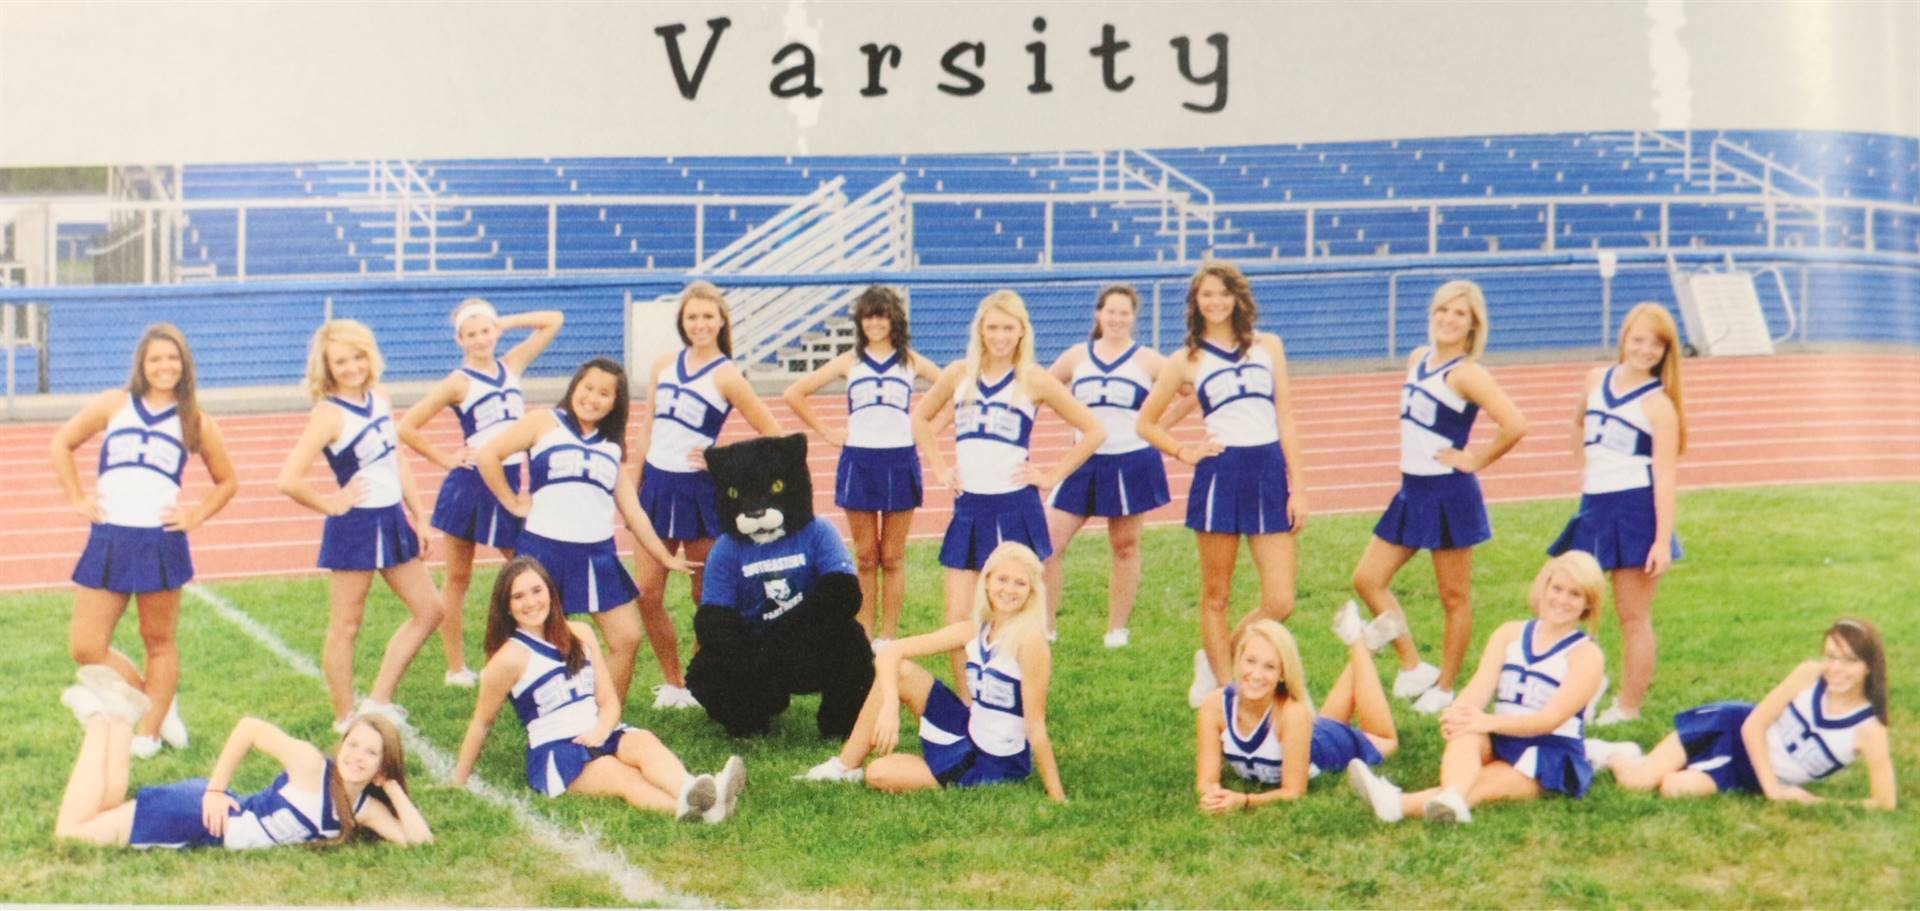 2013 Varsity Cheerleading